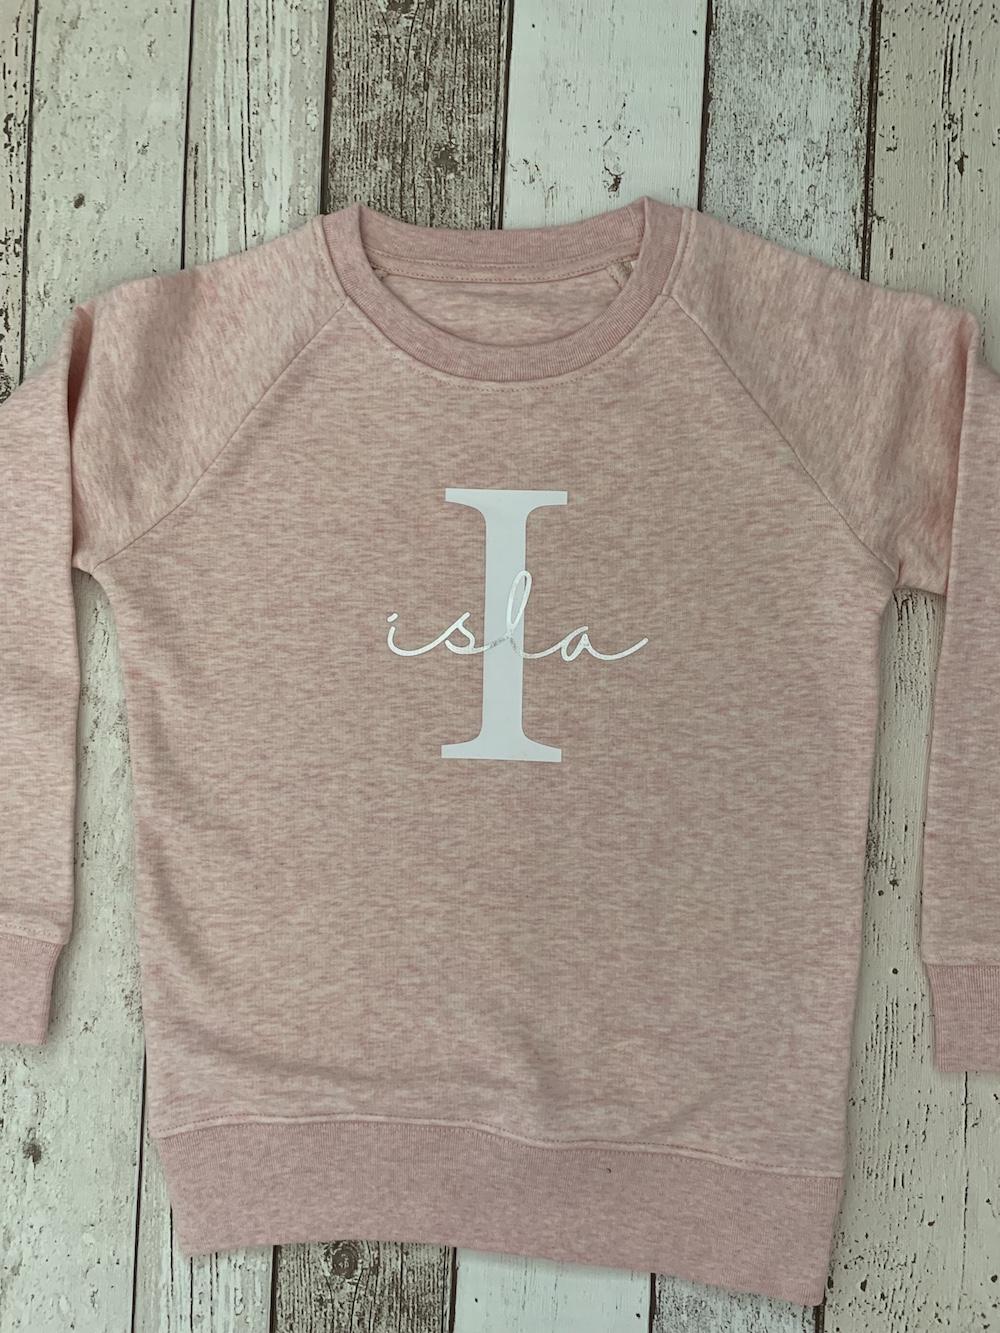 Pretty Initial Pink Sweatshirt – Children's Size